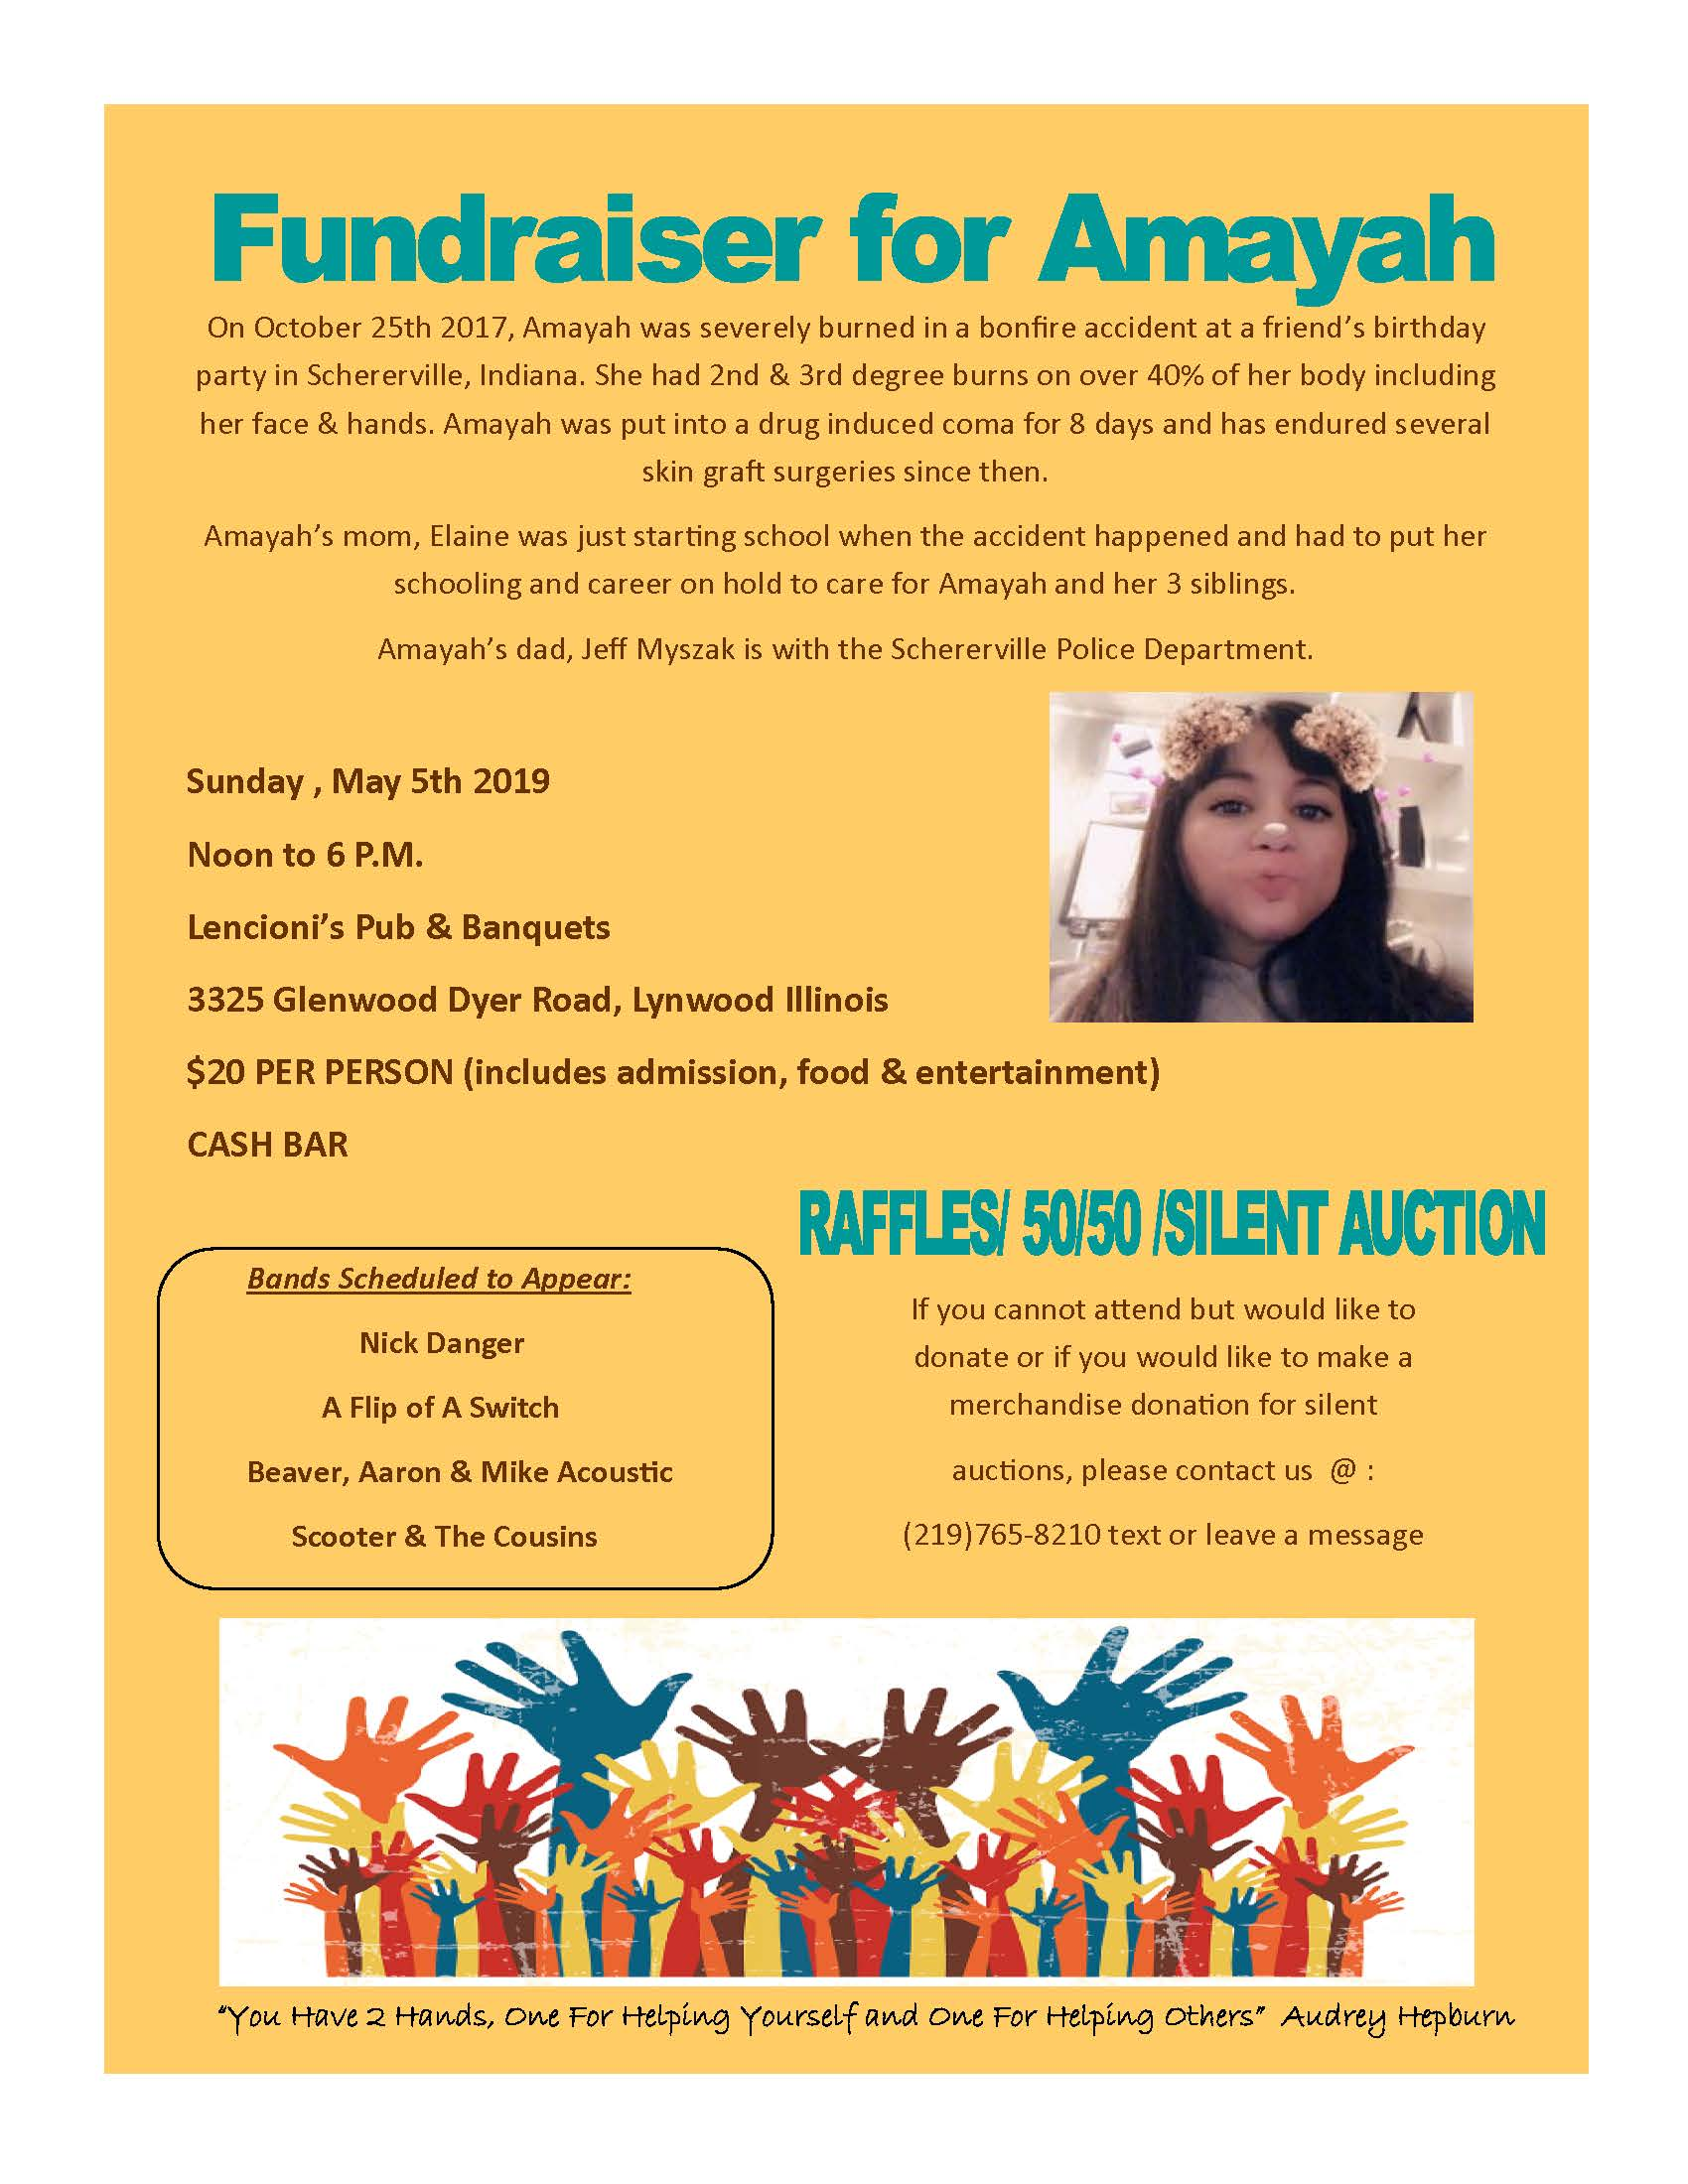 Fundraiser for Amayah Flyer